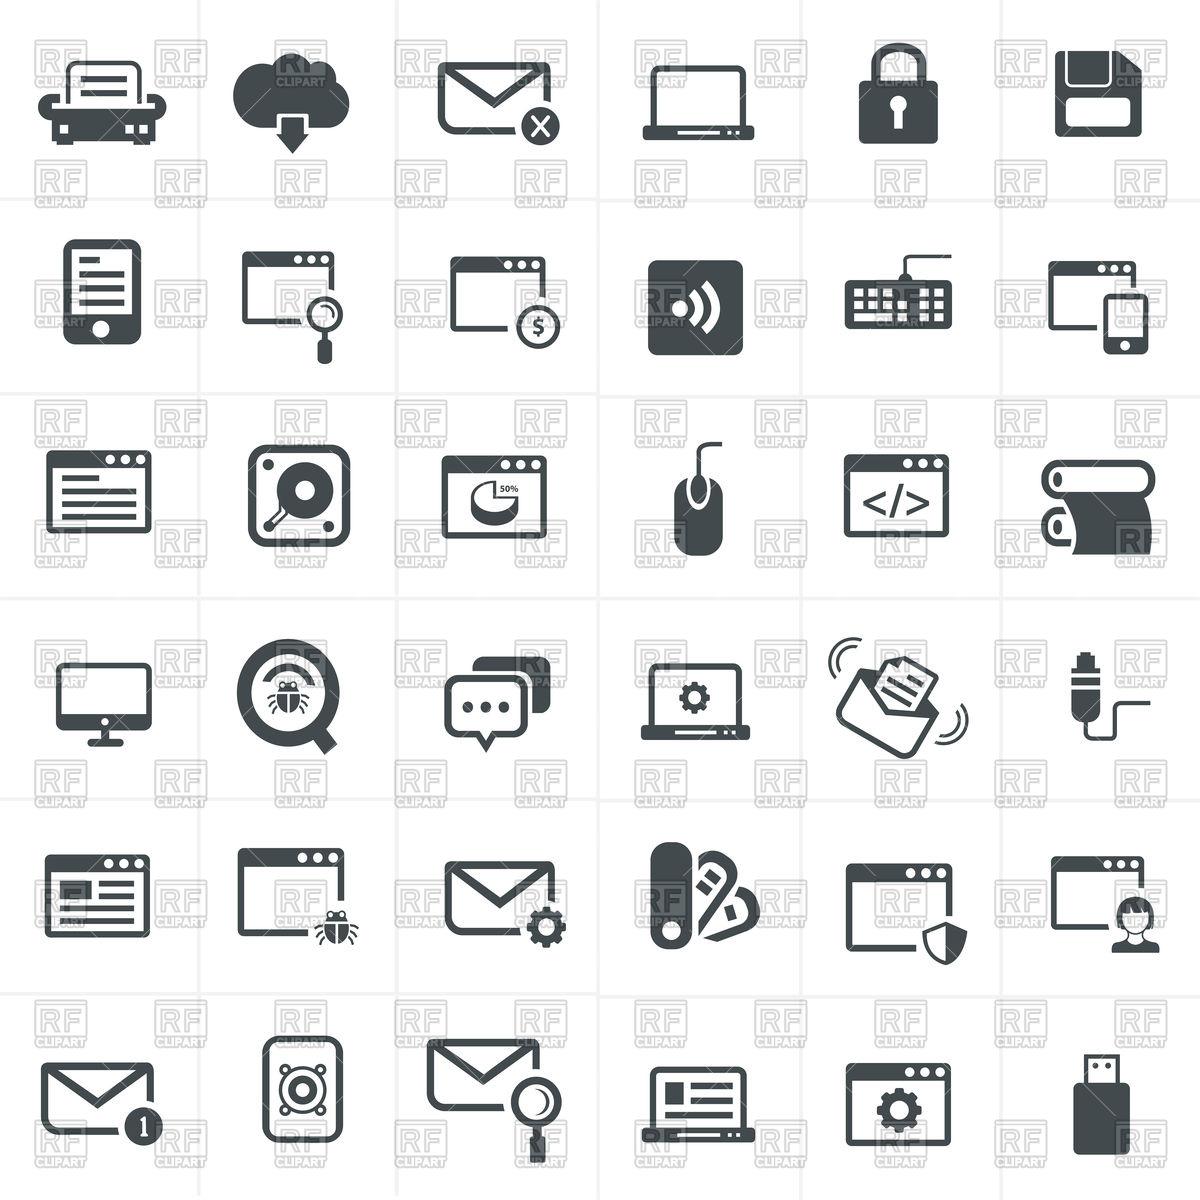 Clipart Network Symbols 20 Free Cliparts